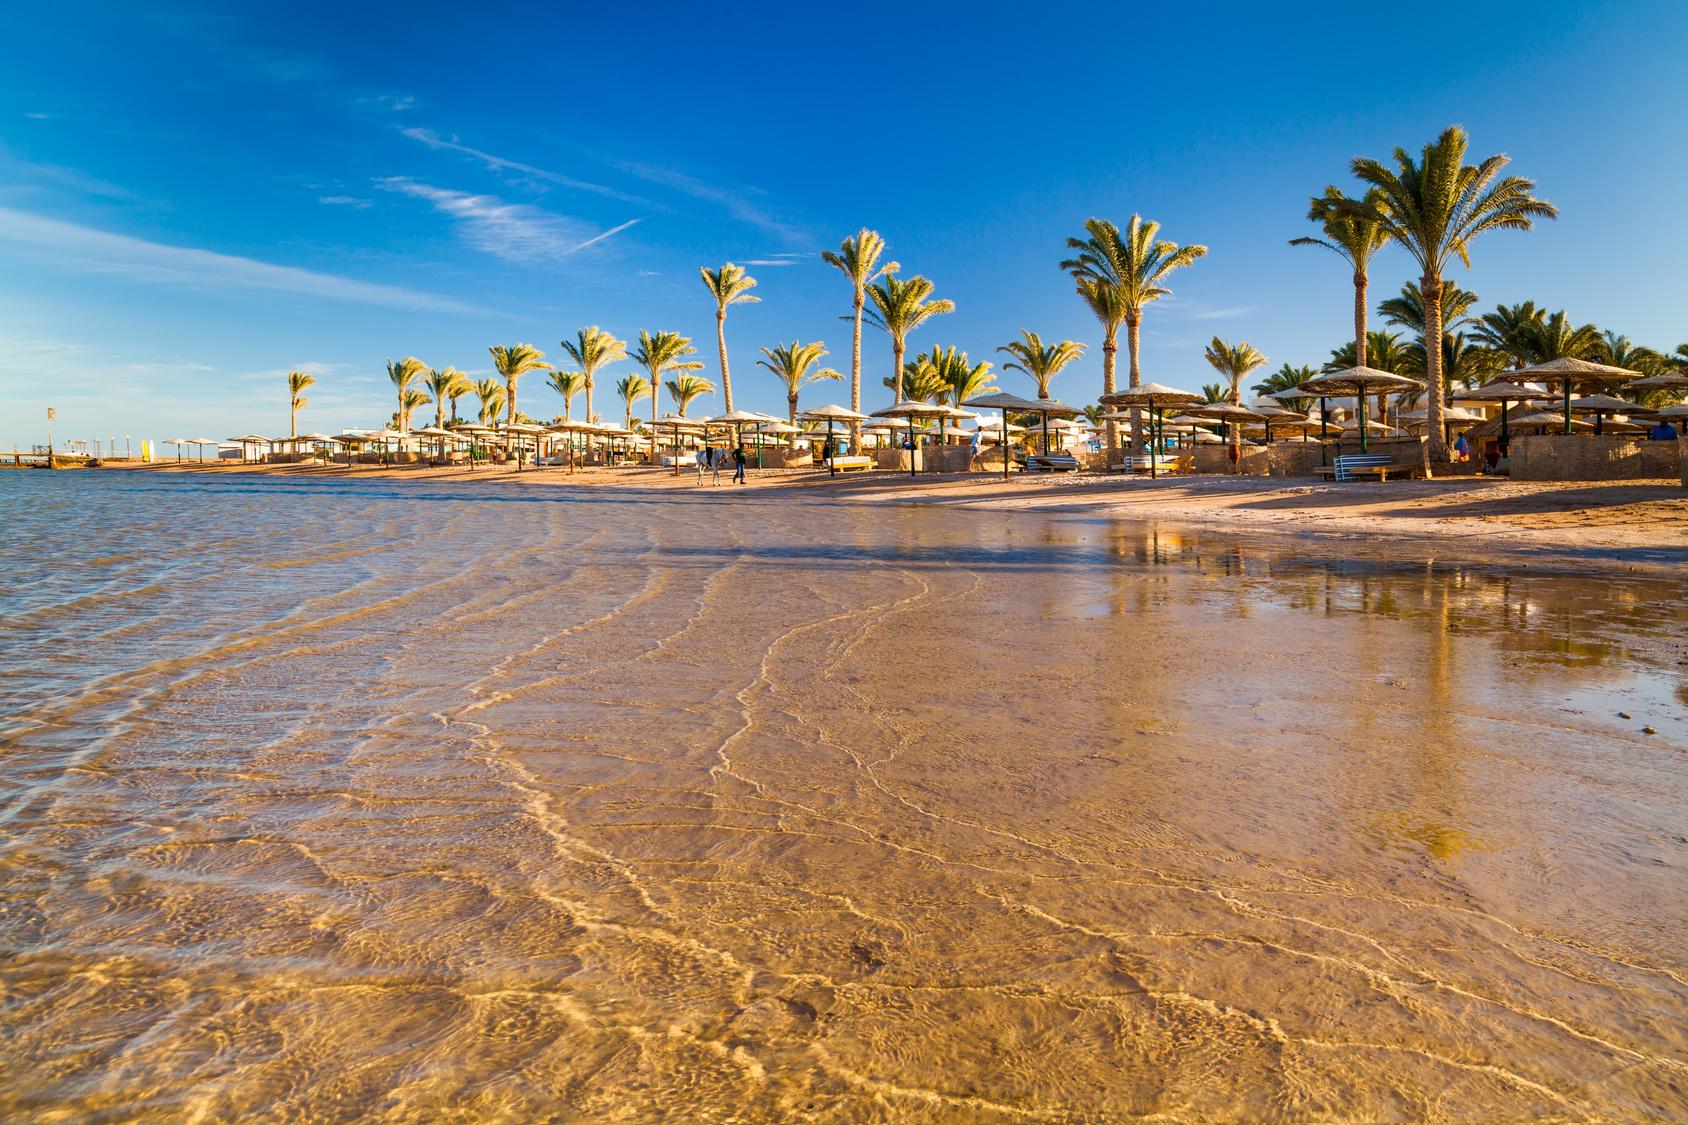 Wczasy Hurghada Egipt